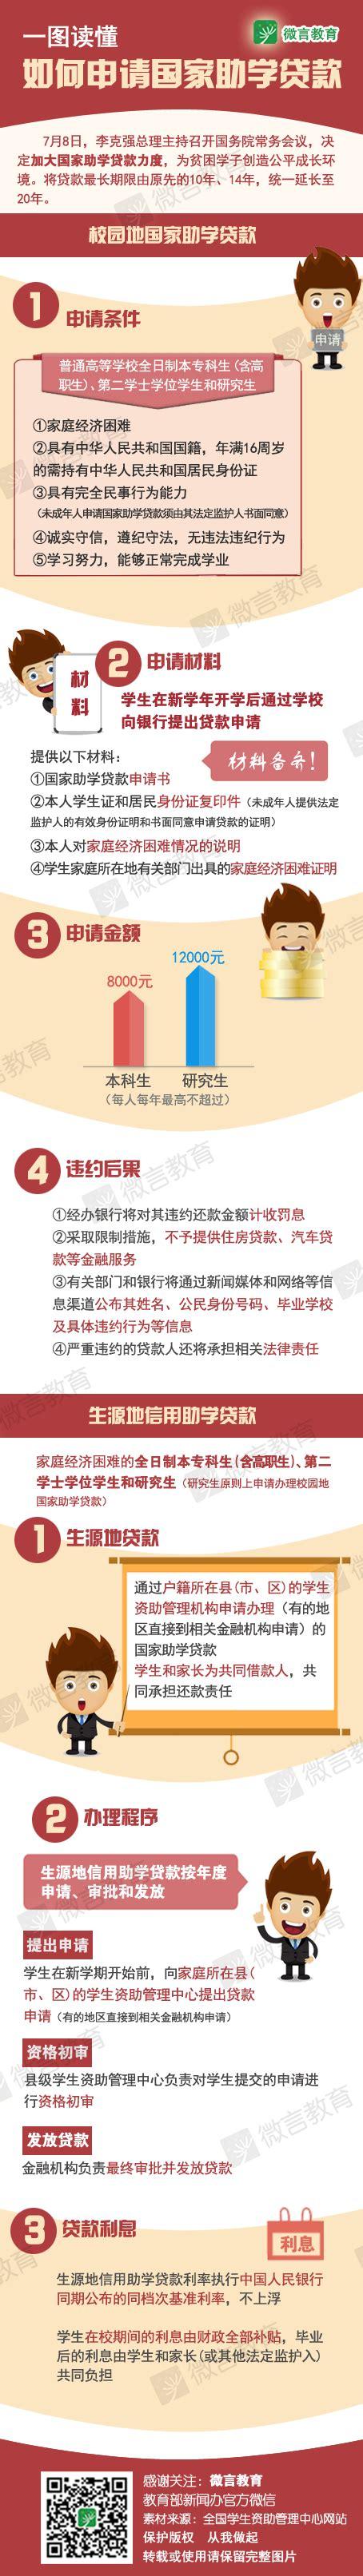 Mba Site Moe Gov Cn by 一图读懂如何申请国家助学贷款 中国在线